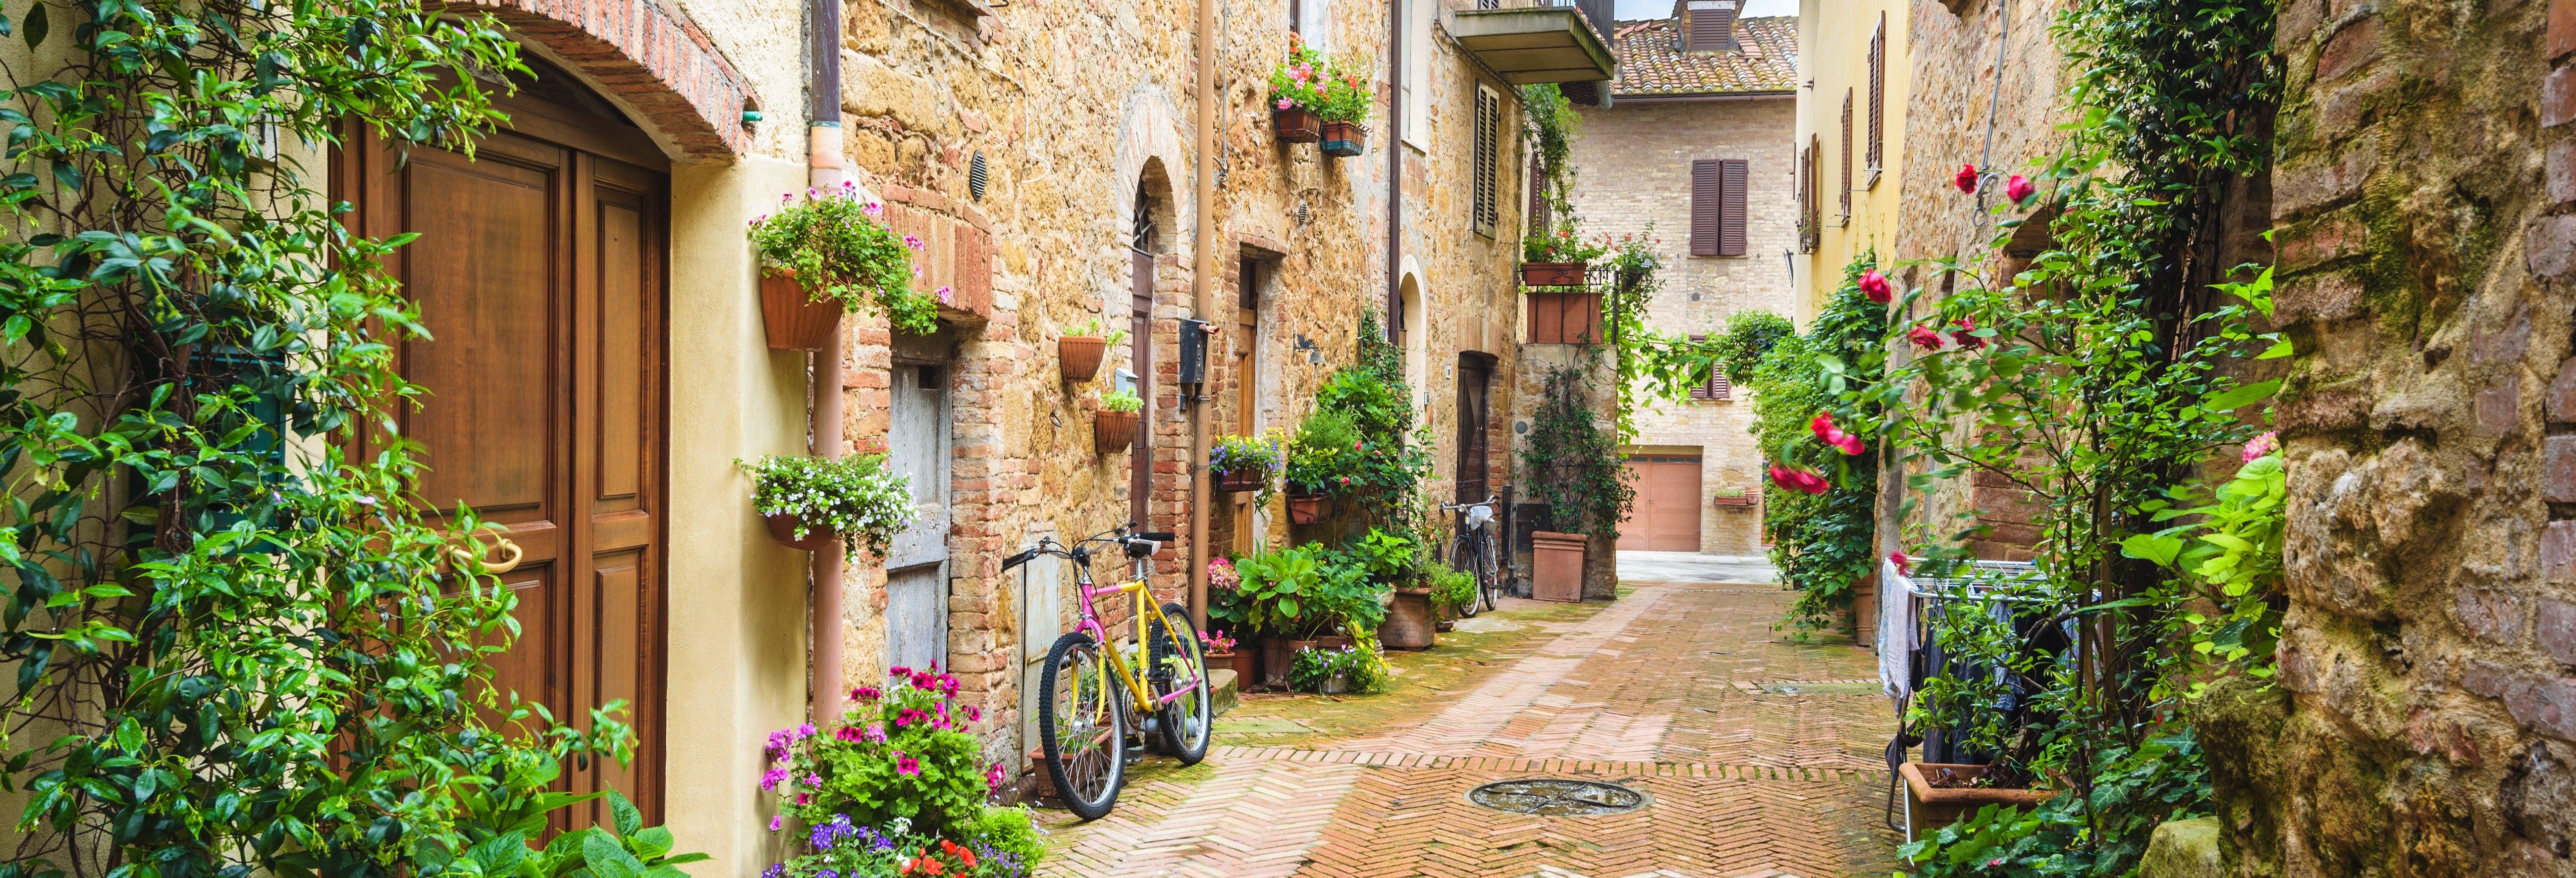 Excursion à Montalcino, Pienza et Montepulciano